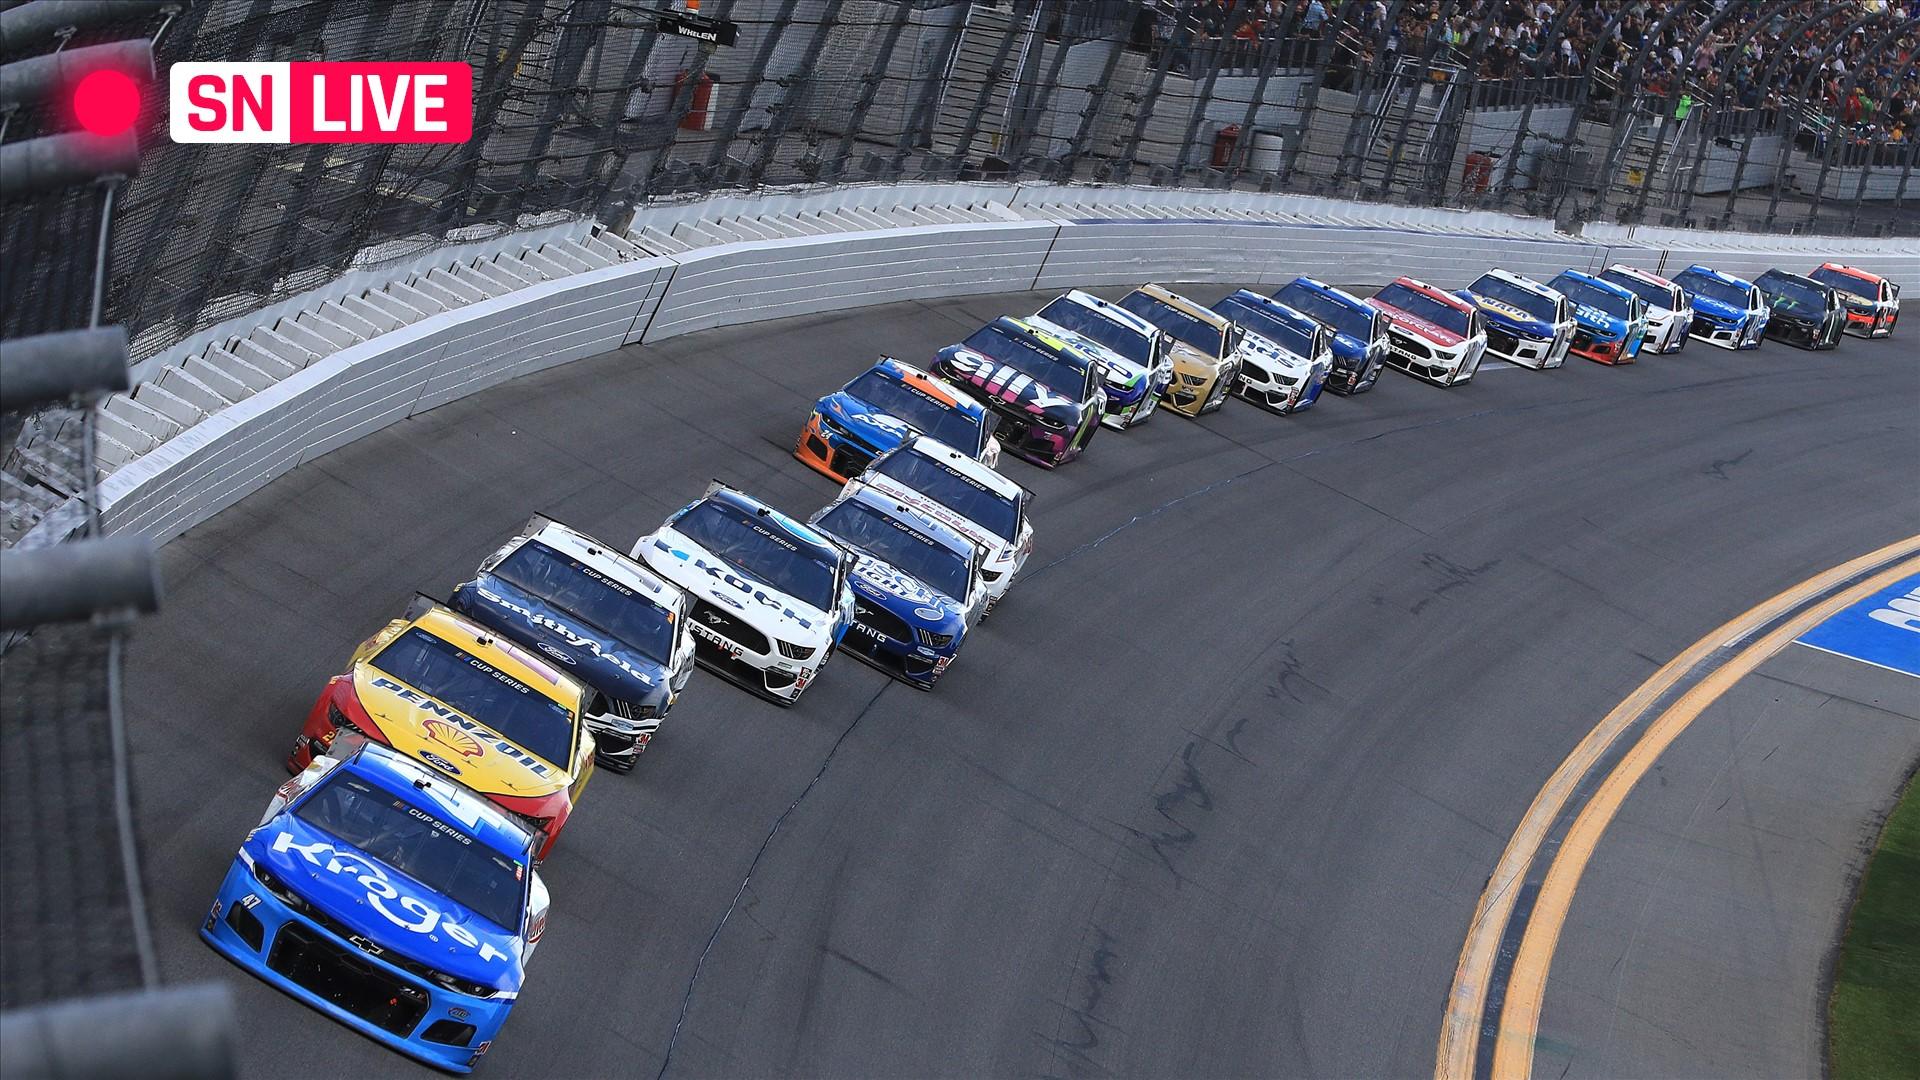 Daytona 500 live updates, results, highlights from NASCAR